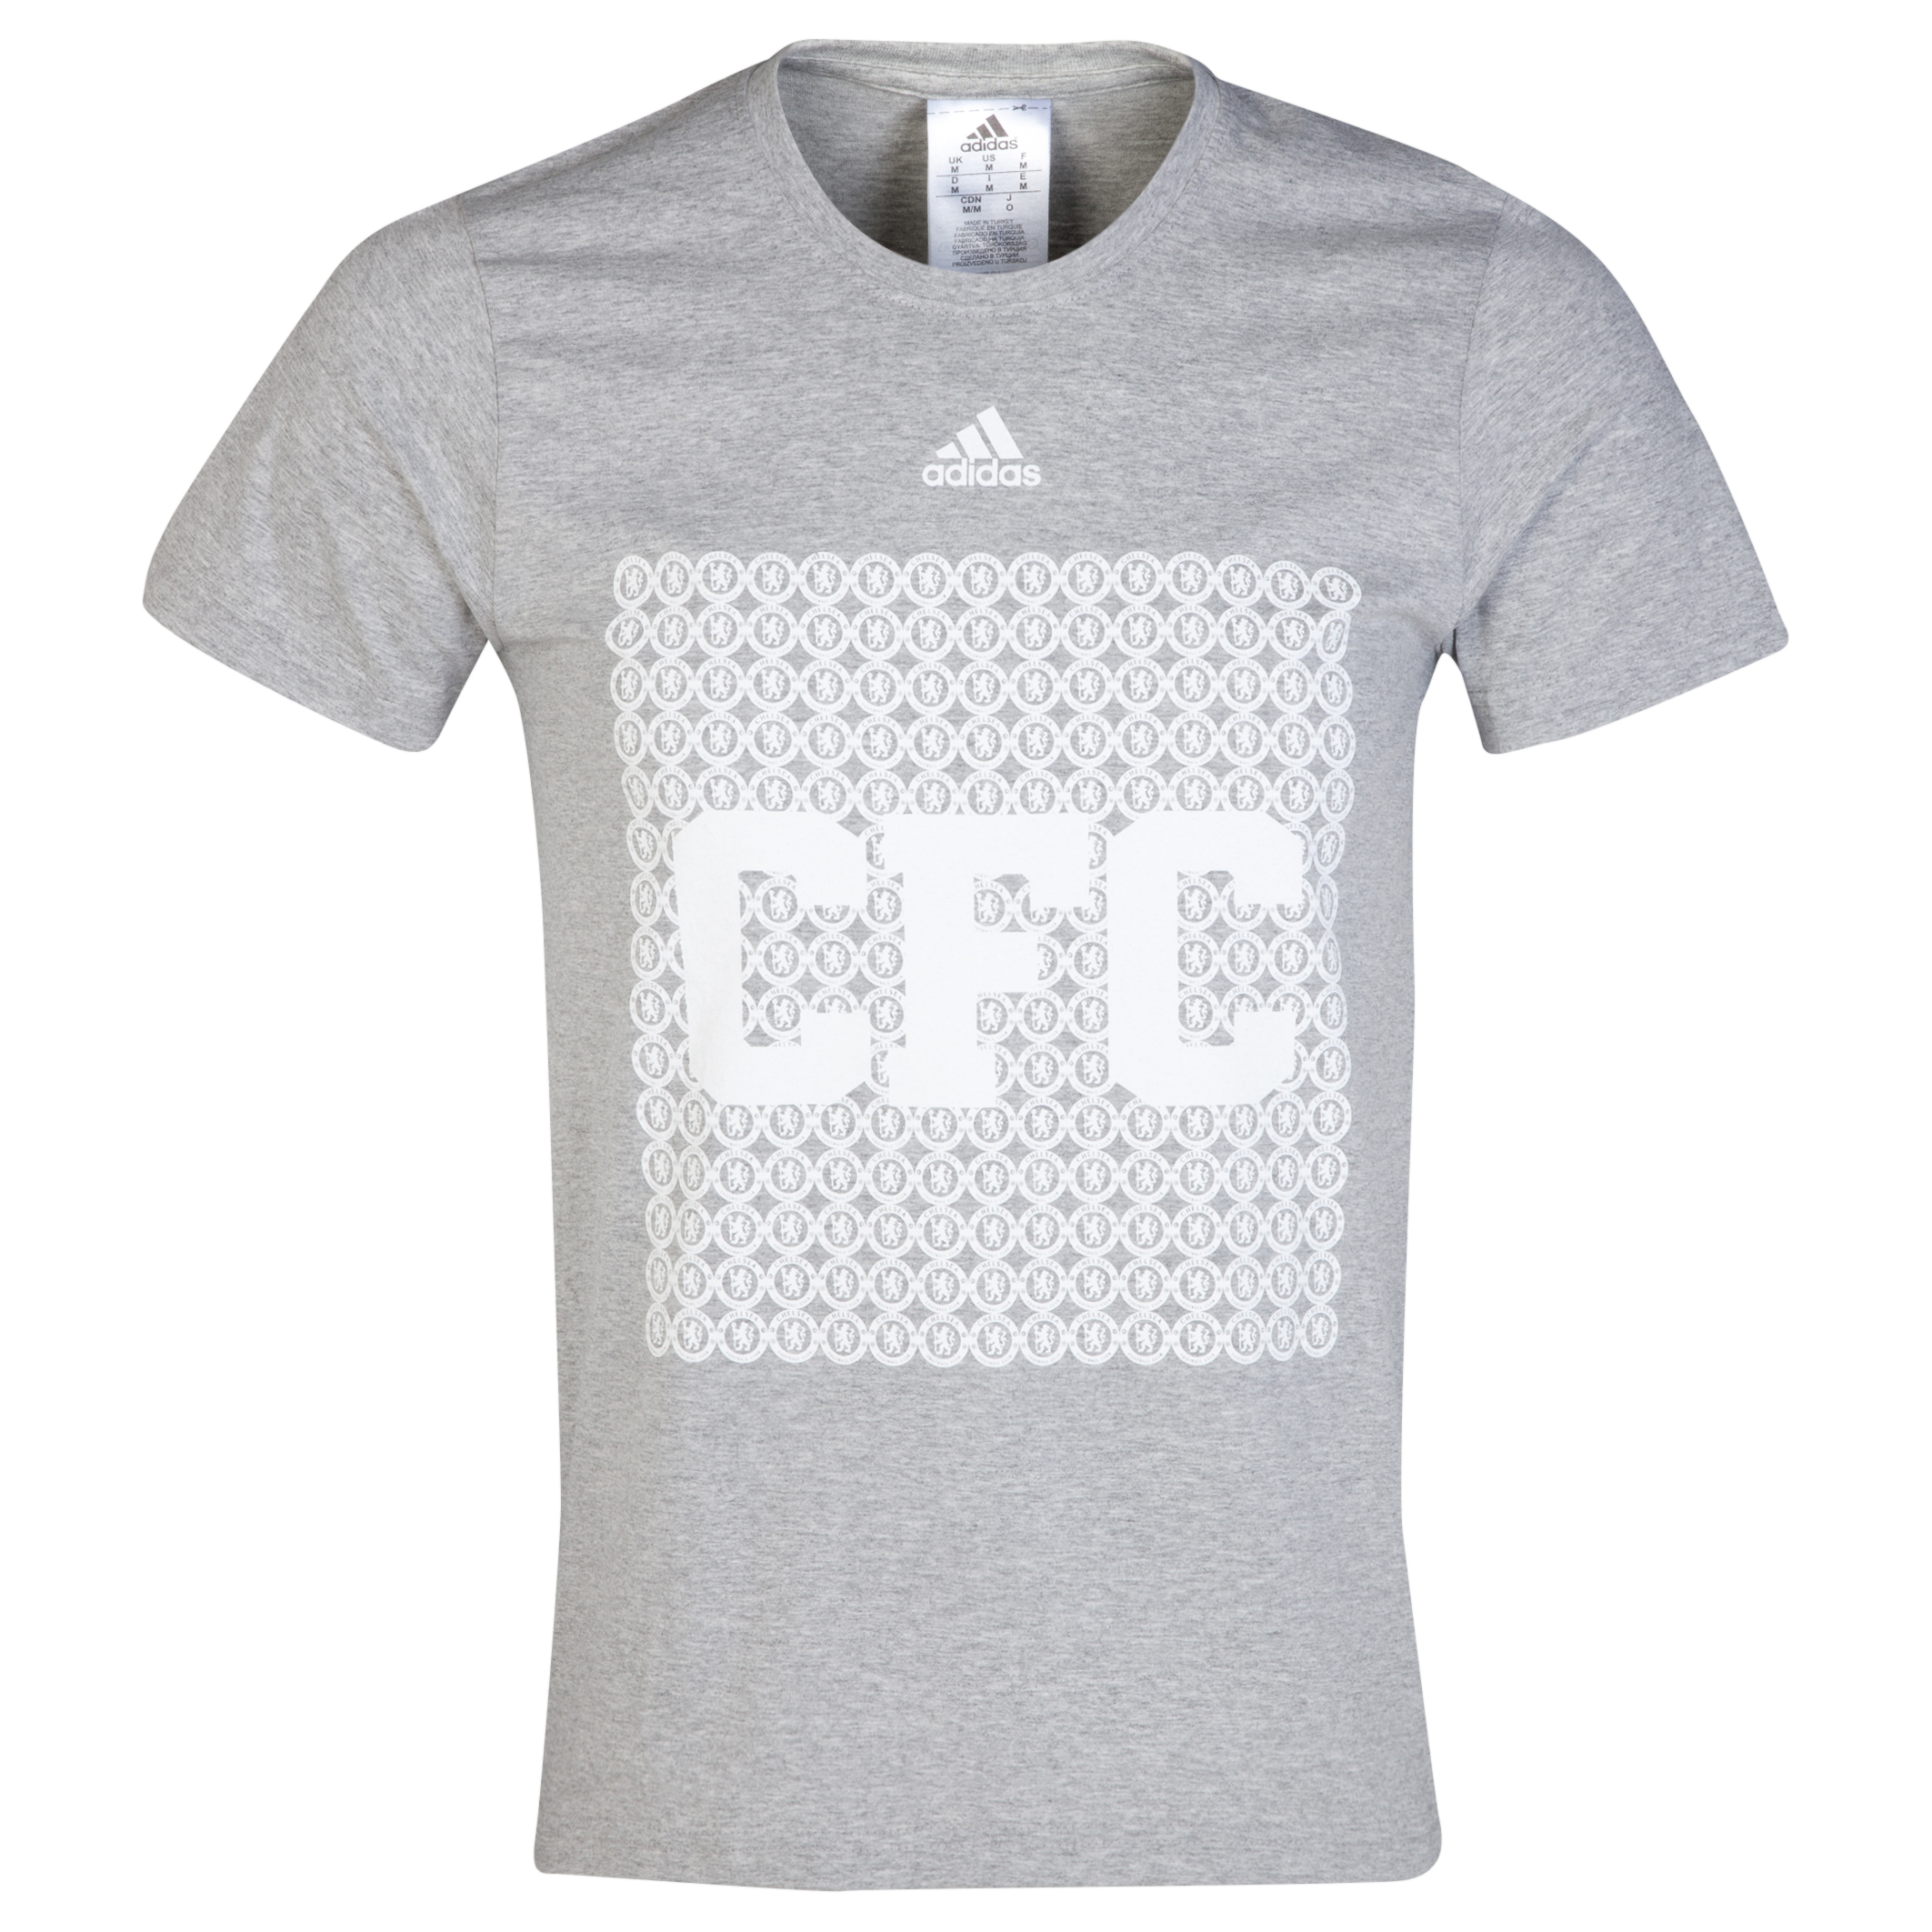 Chelsea Adidas CFC Text T-Shirt Grey